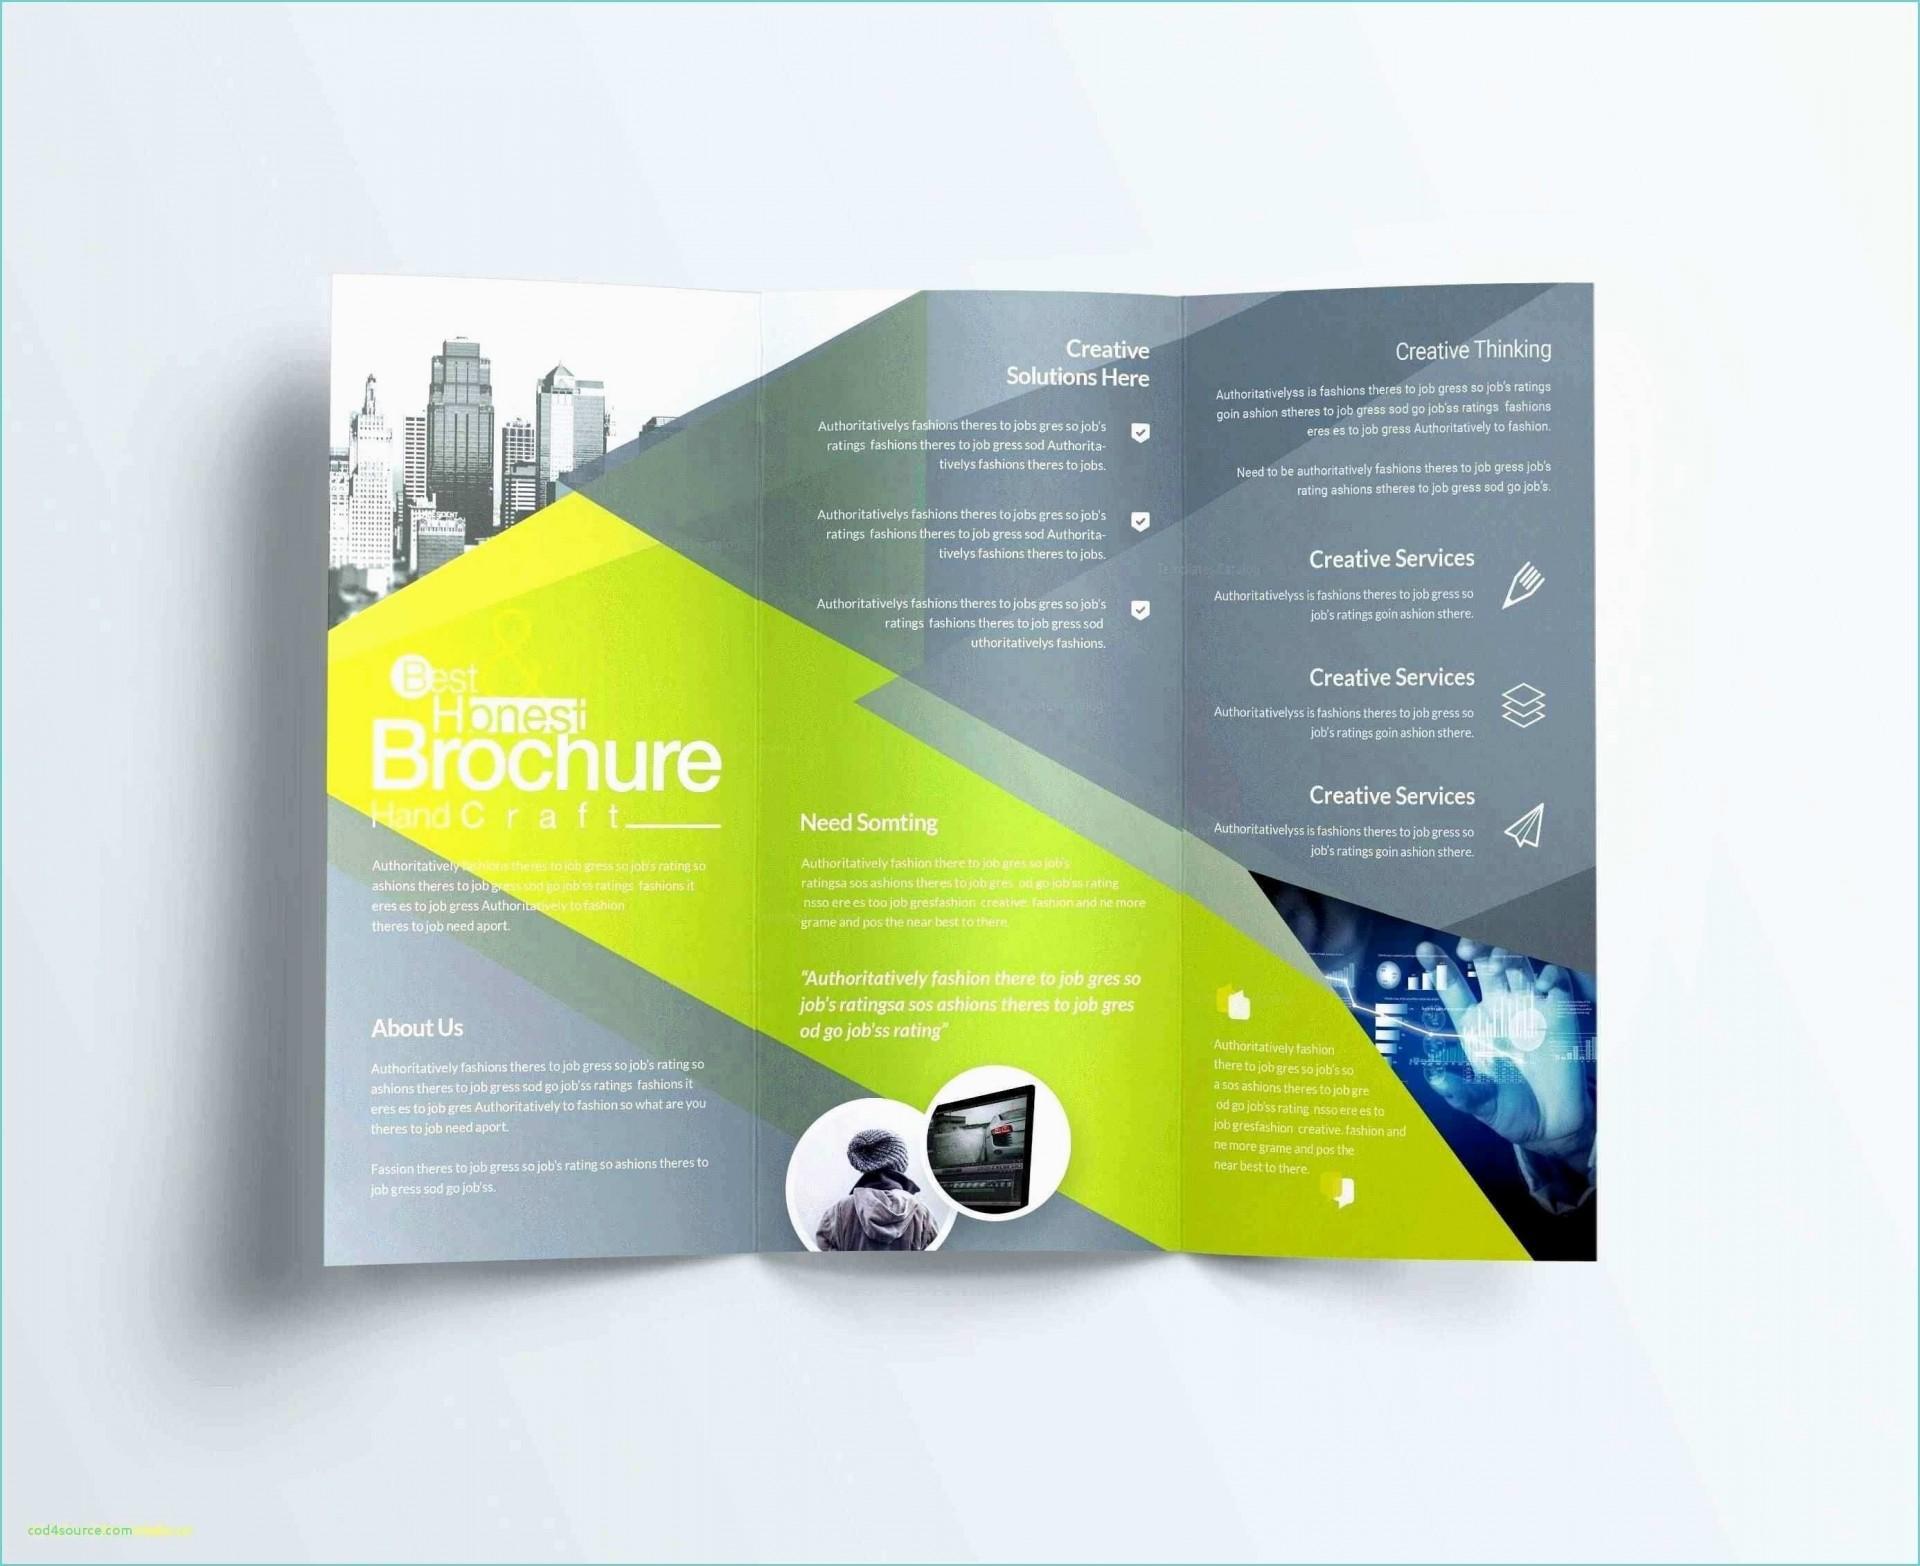 004 Wondrou Brochure Template For Word Mac Inspiration  Tri Fold Free1920